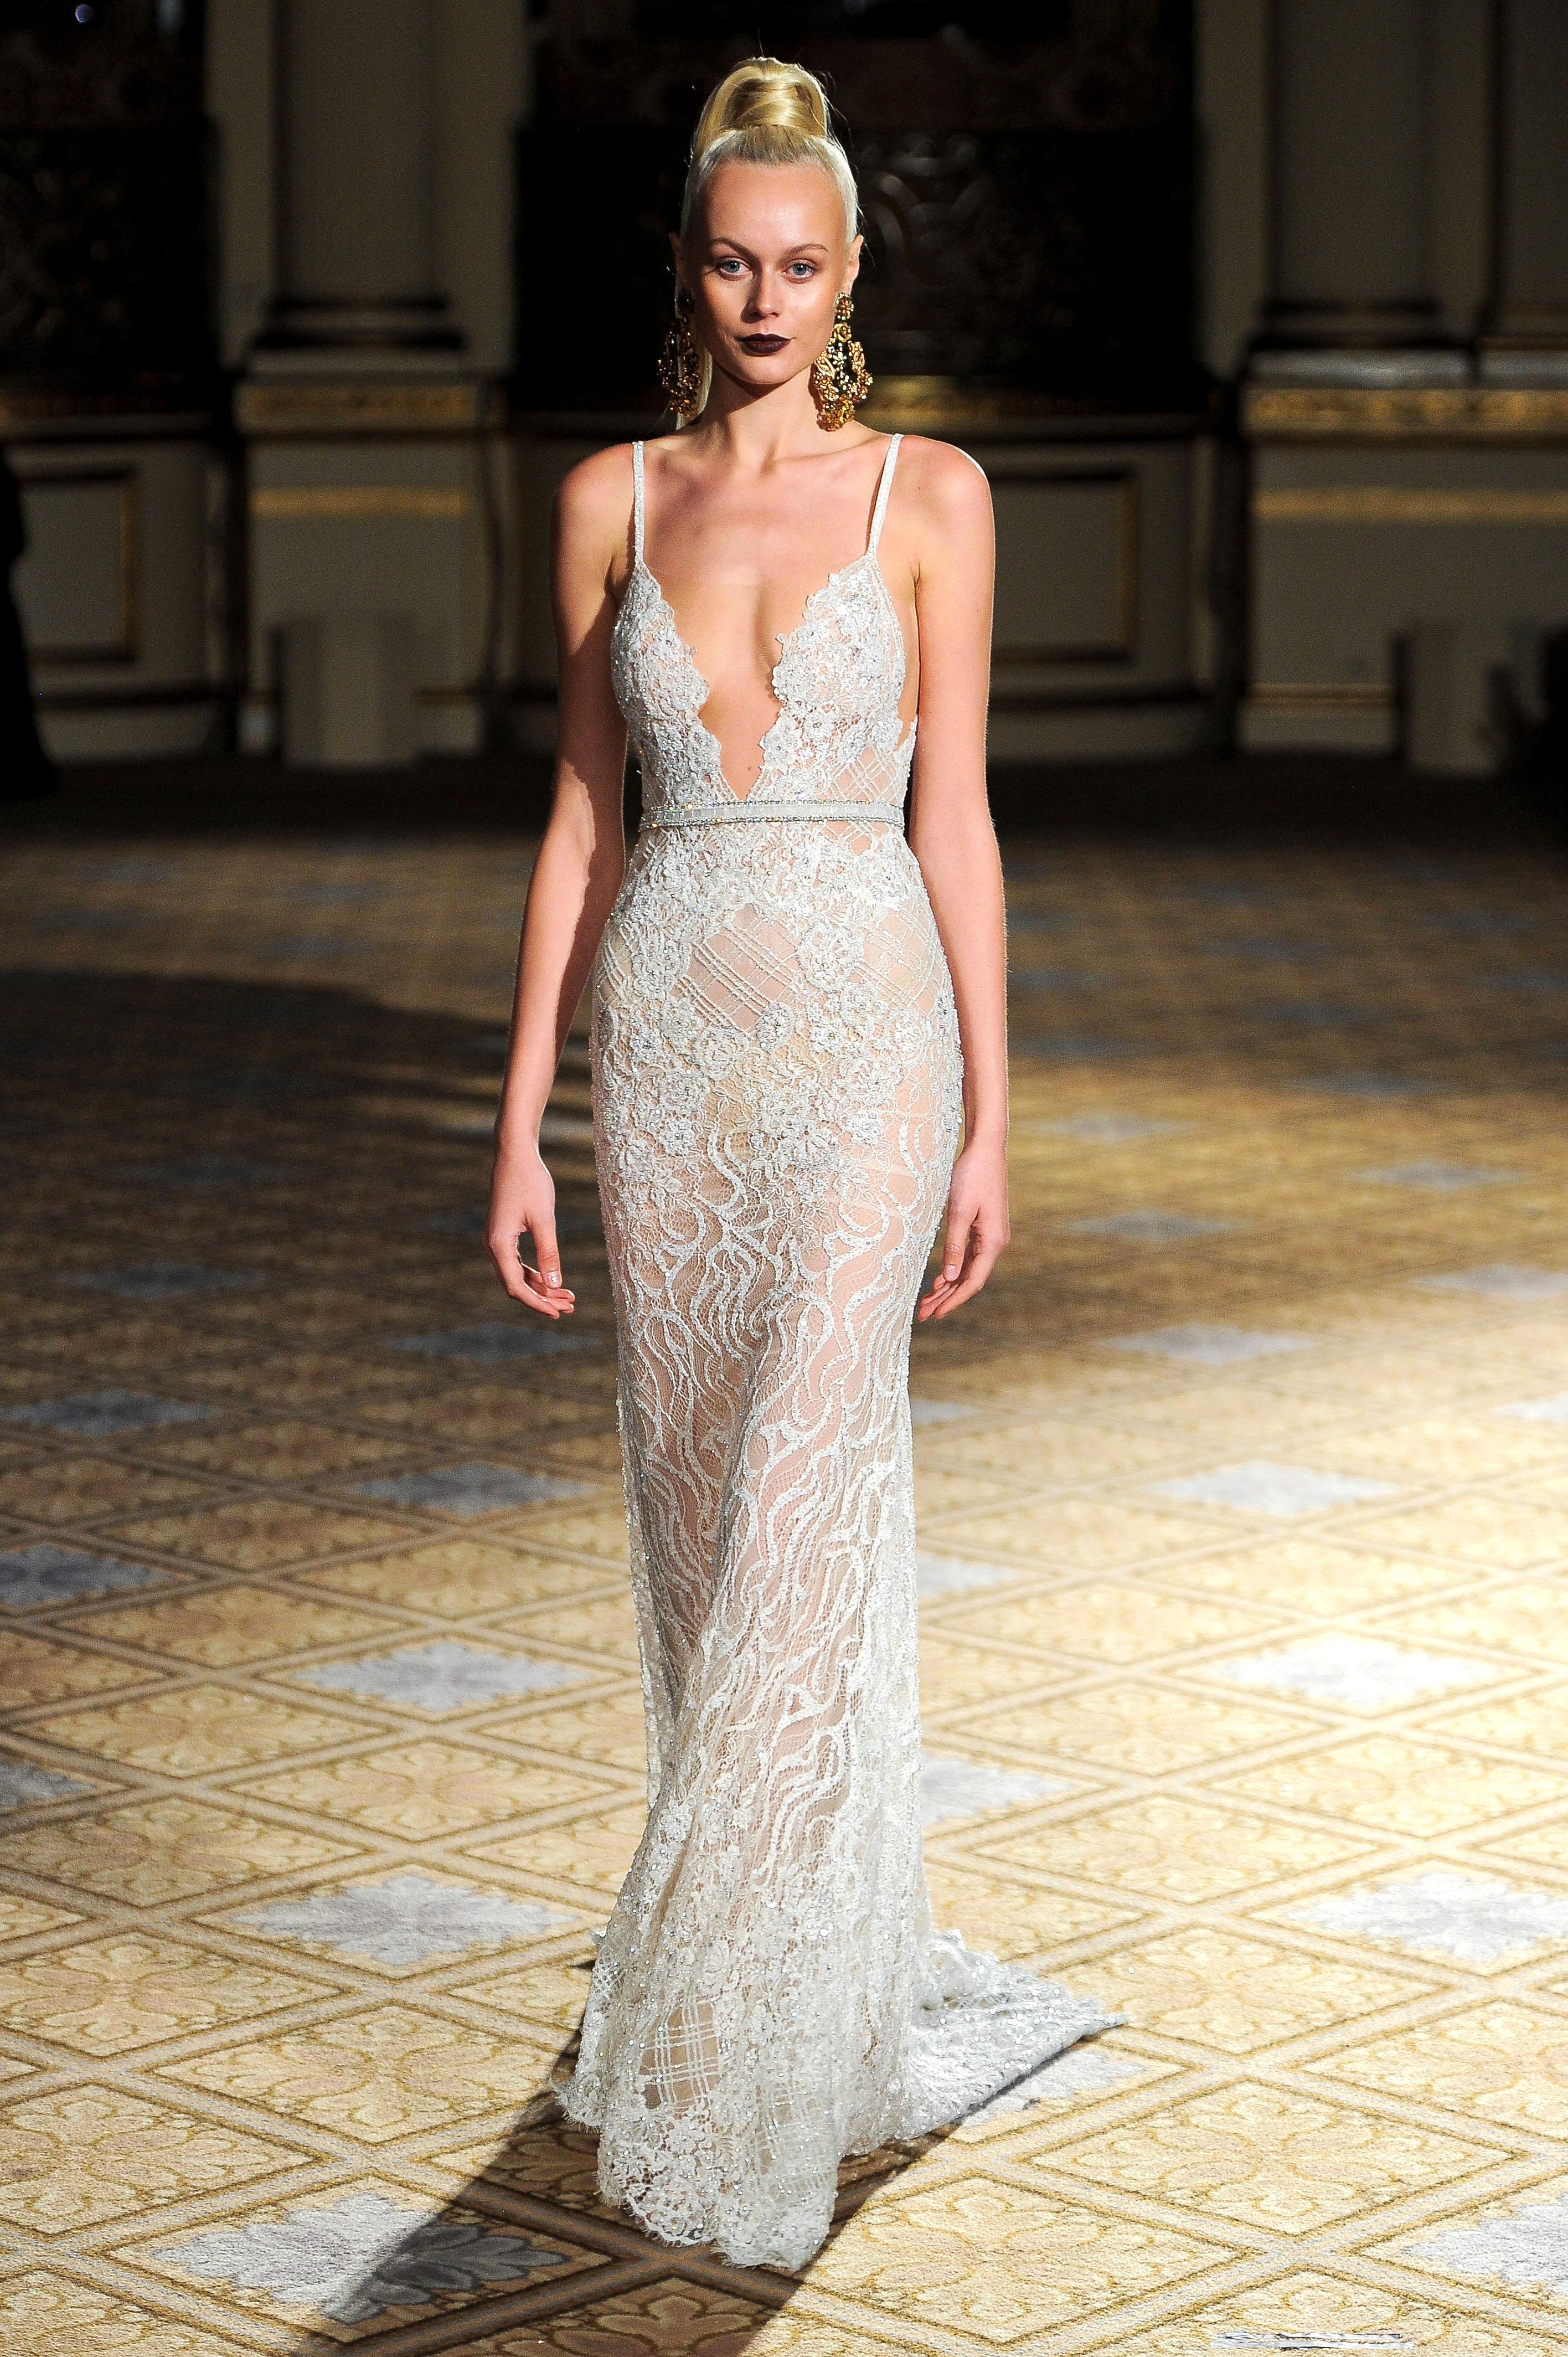 berta spaghetti strap v-neck lace wedding dress spring 2018